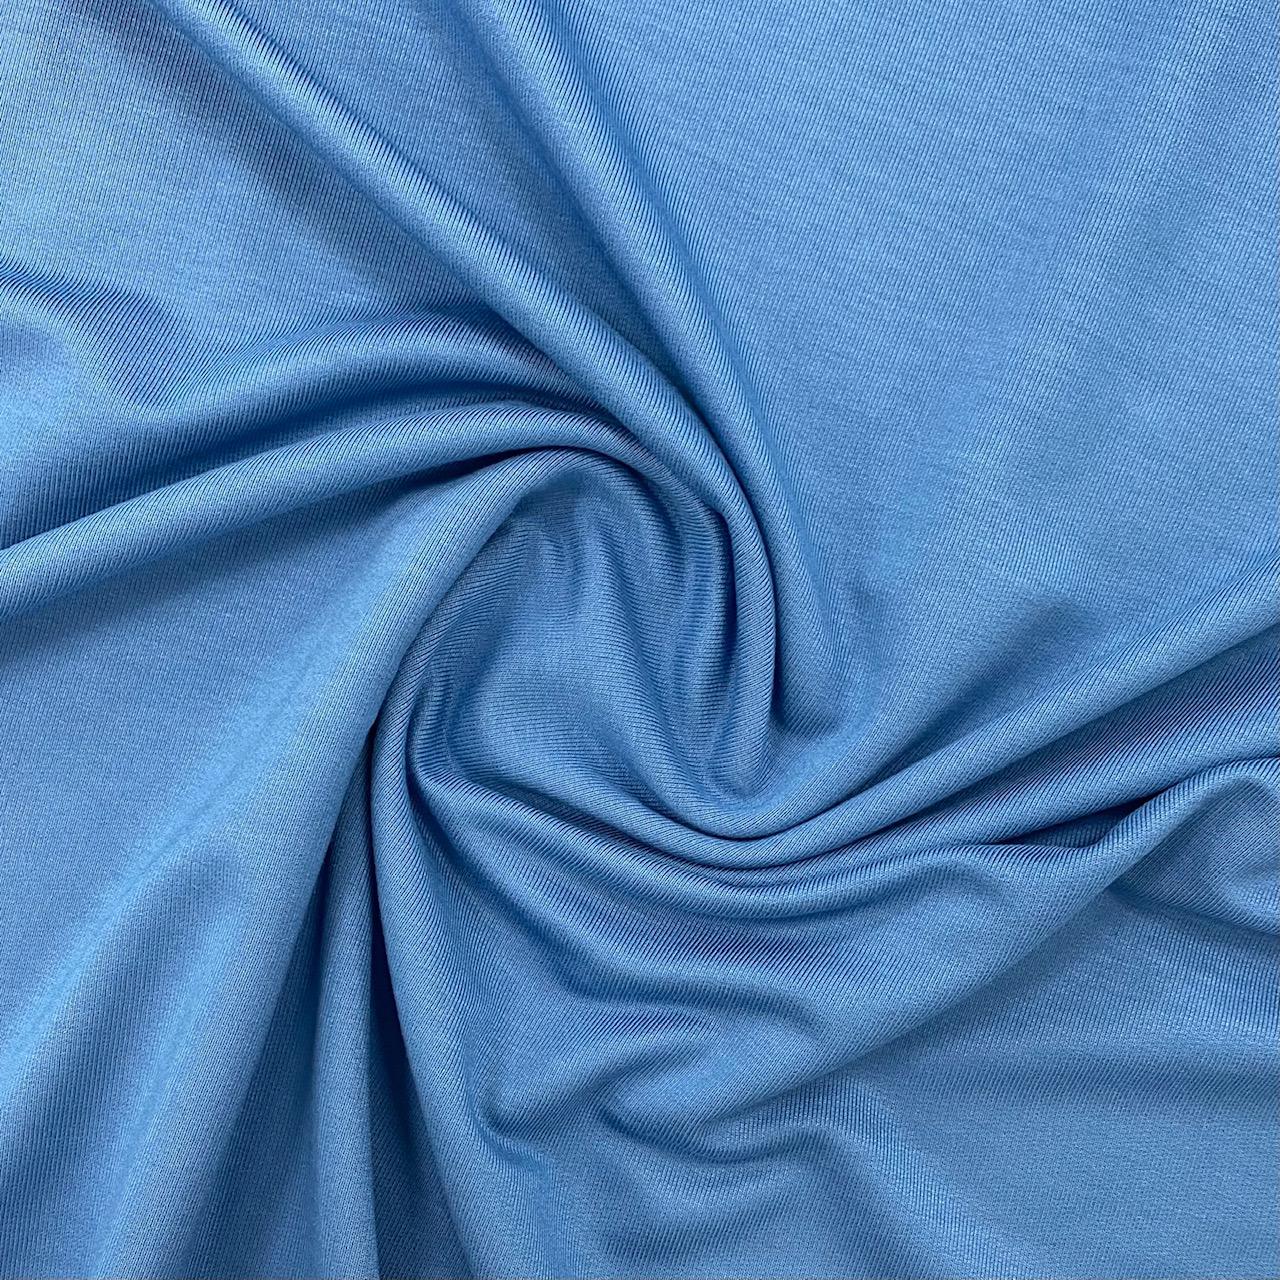 Fibre Mood #Alena, French Terry, Bambus, parisian blue. Art. FM779502